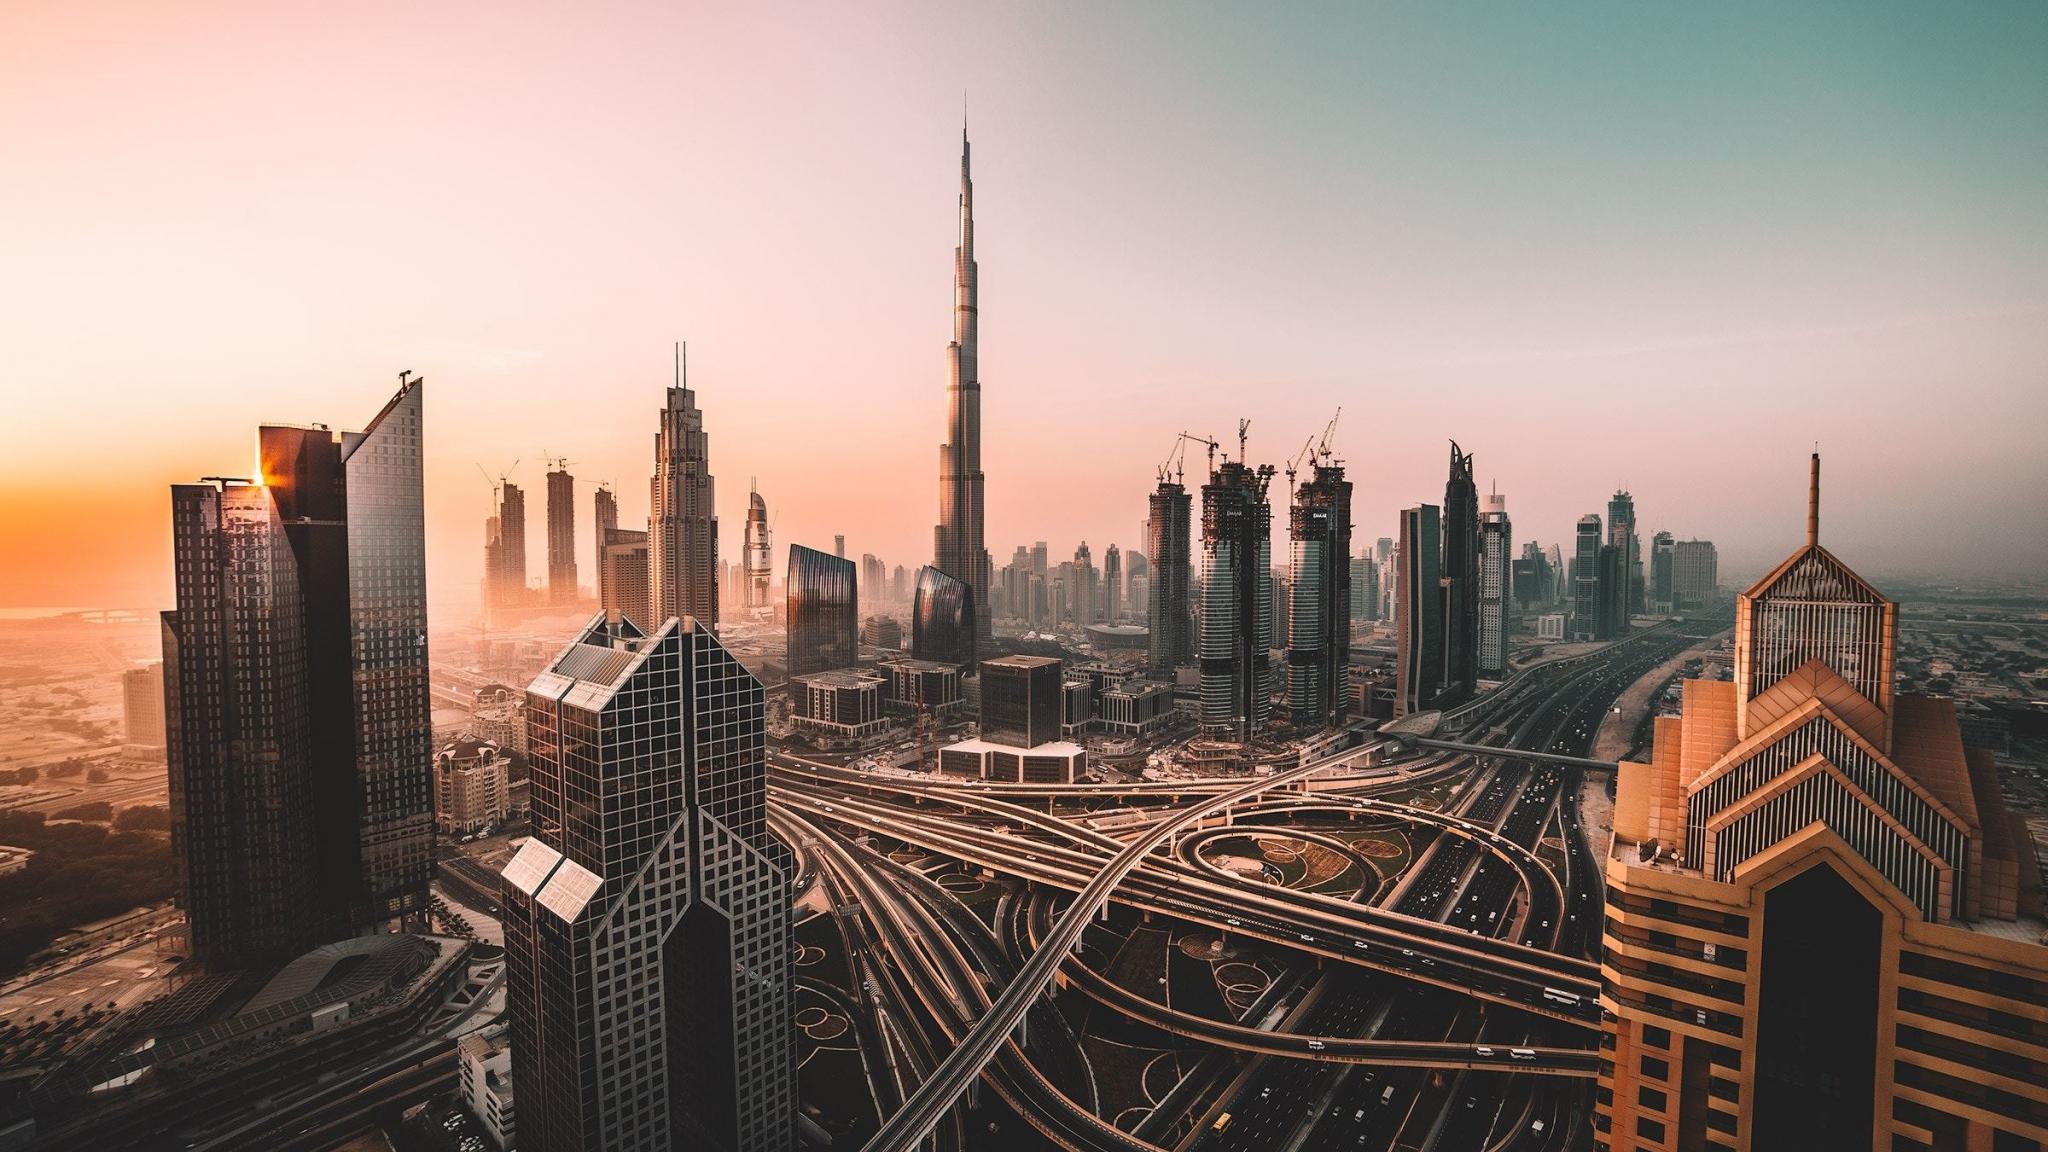 Dubai, skyline, cityscape, skyscrapers, buildings, Burj Khalifa, city, 2048x1152 wallpaper